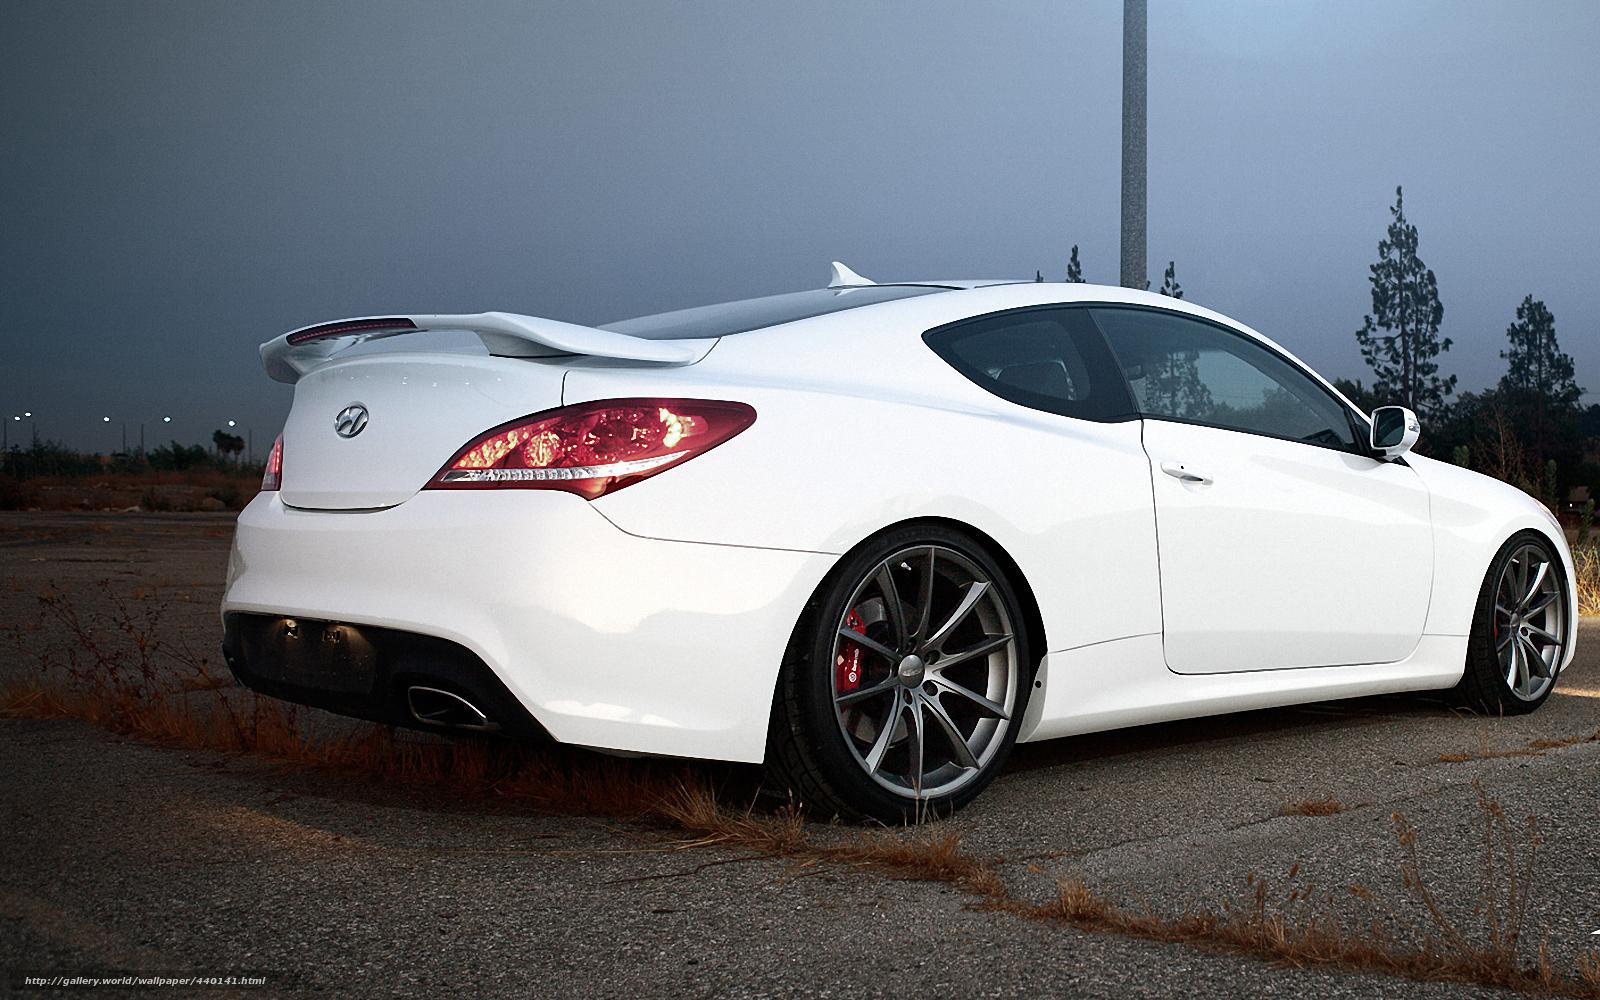 White genesis coupe image